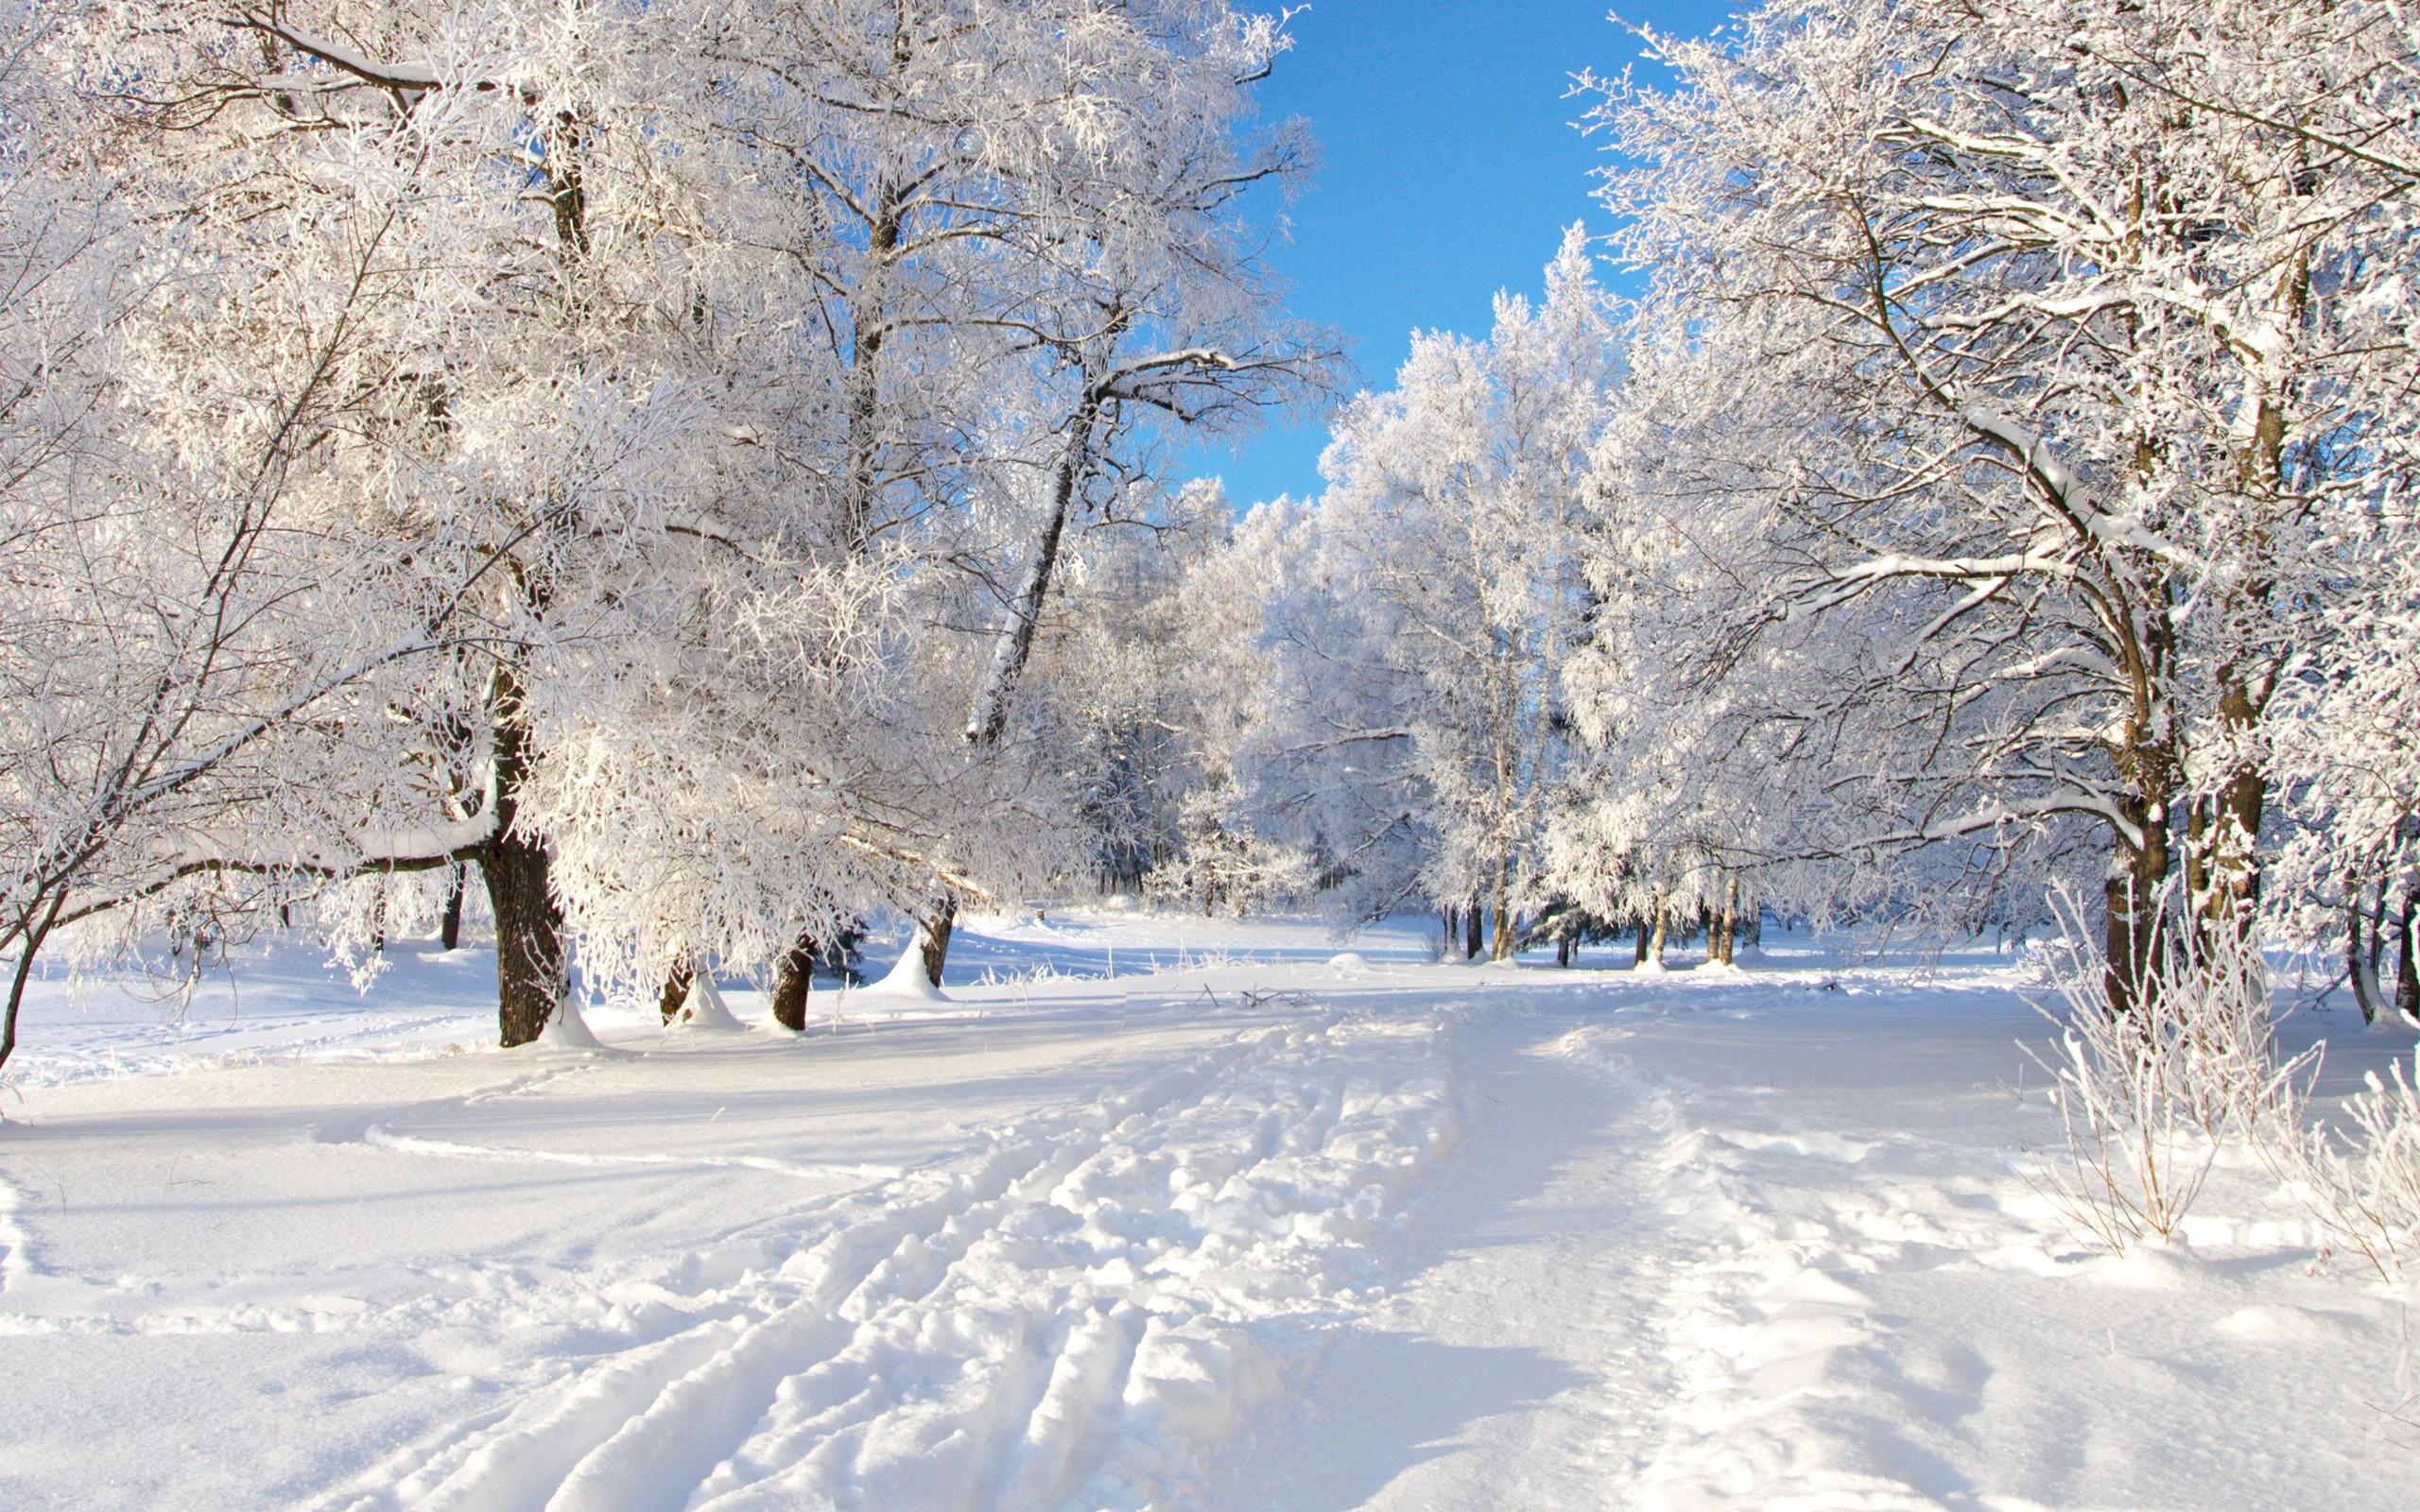 Snow Wallpaper Widescreen Hd Desktop Wallpapers 4k Hd